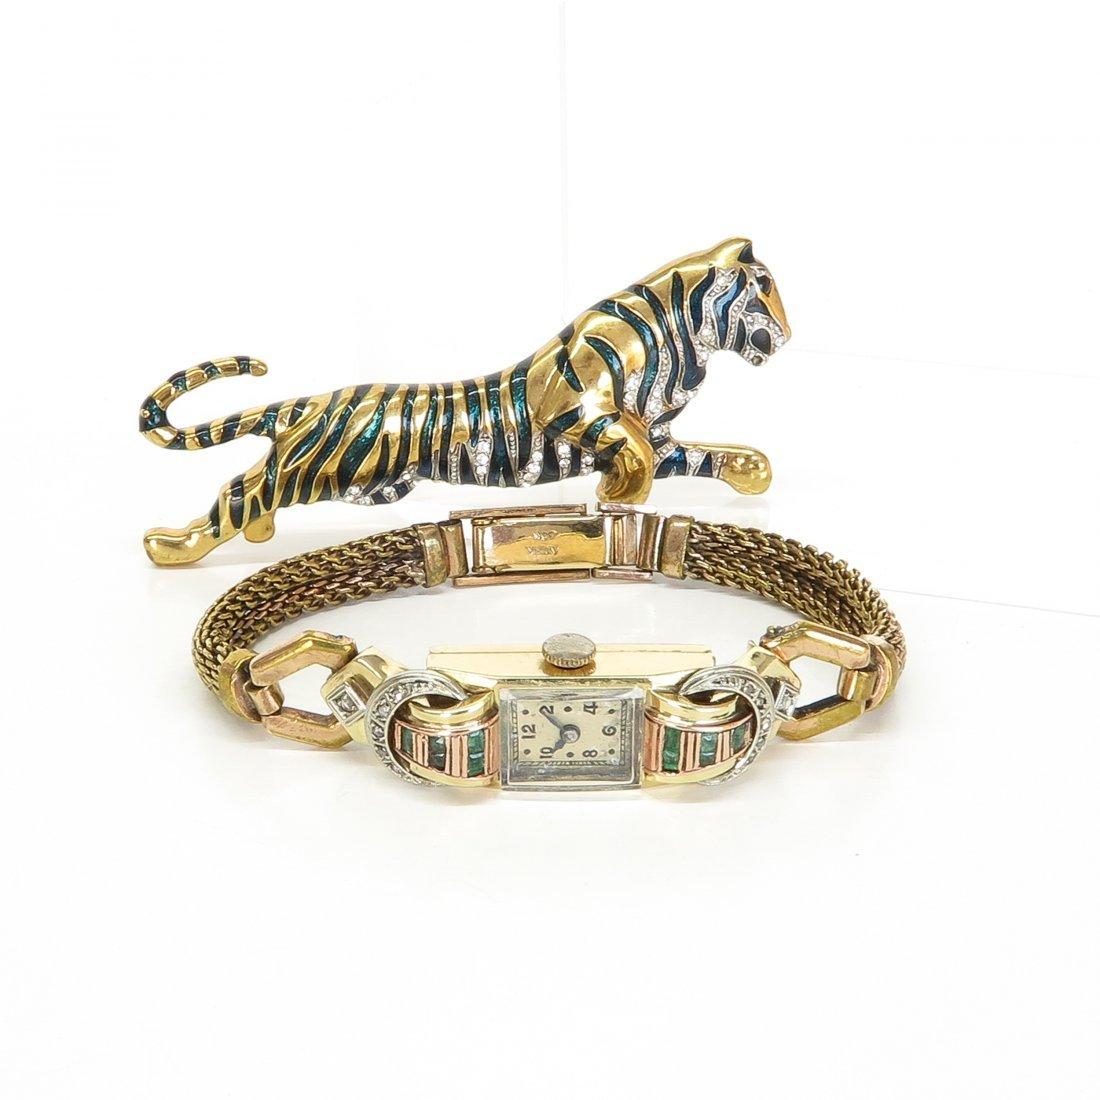 Ladies 14KG Art Deco Diamond and Emerald Watch